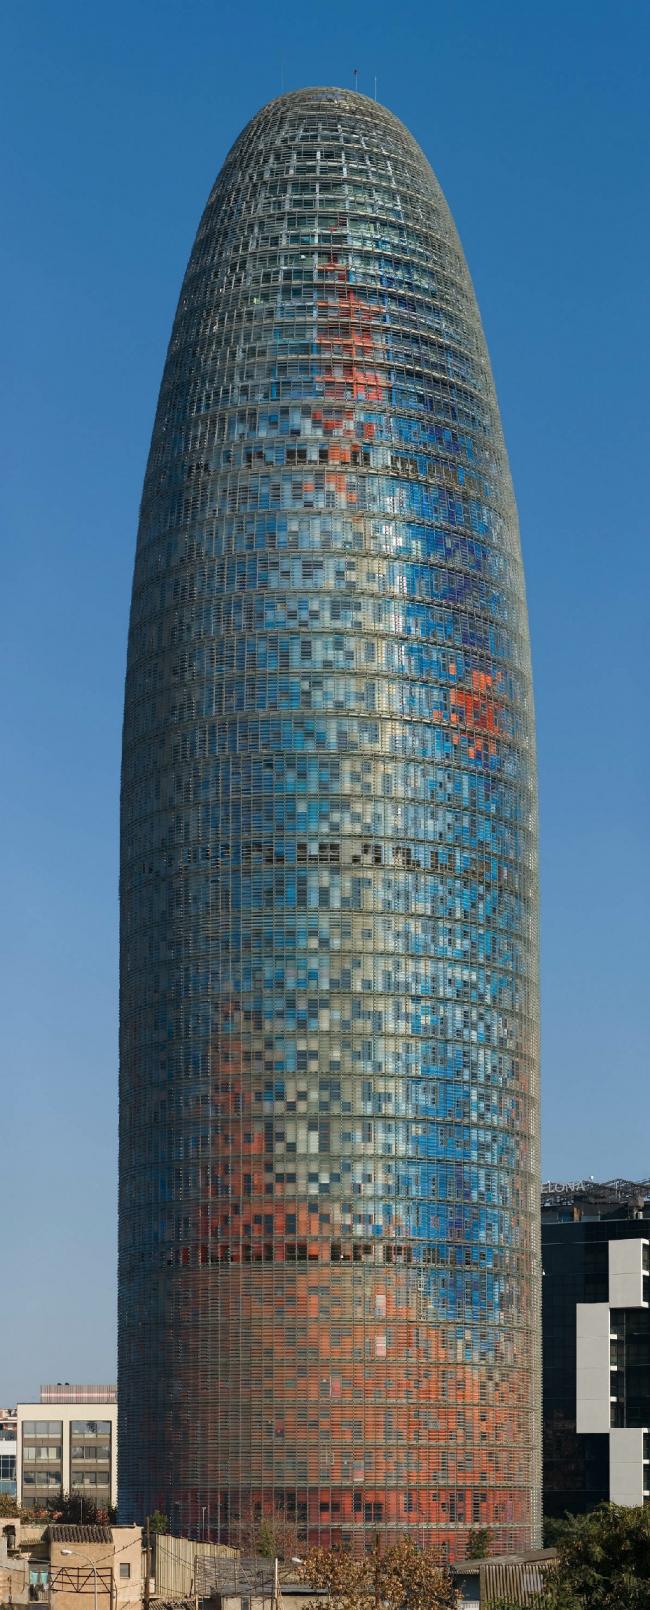 Башня Агбар. Фото: Diliff via Wikimedia Commons. Лицензия CC BY 2.5